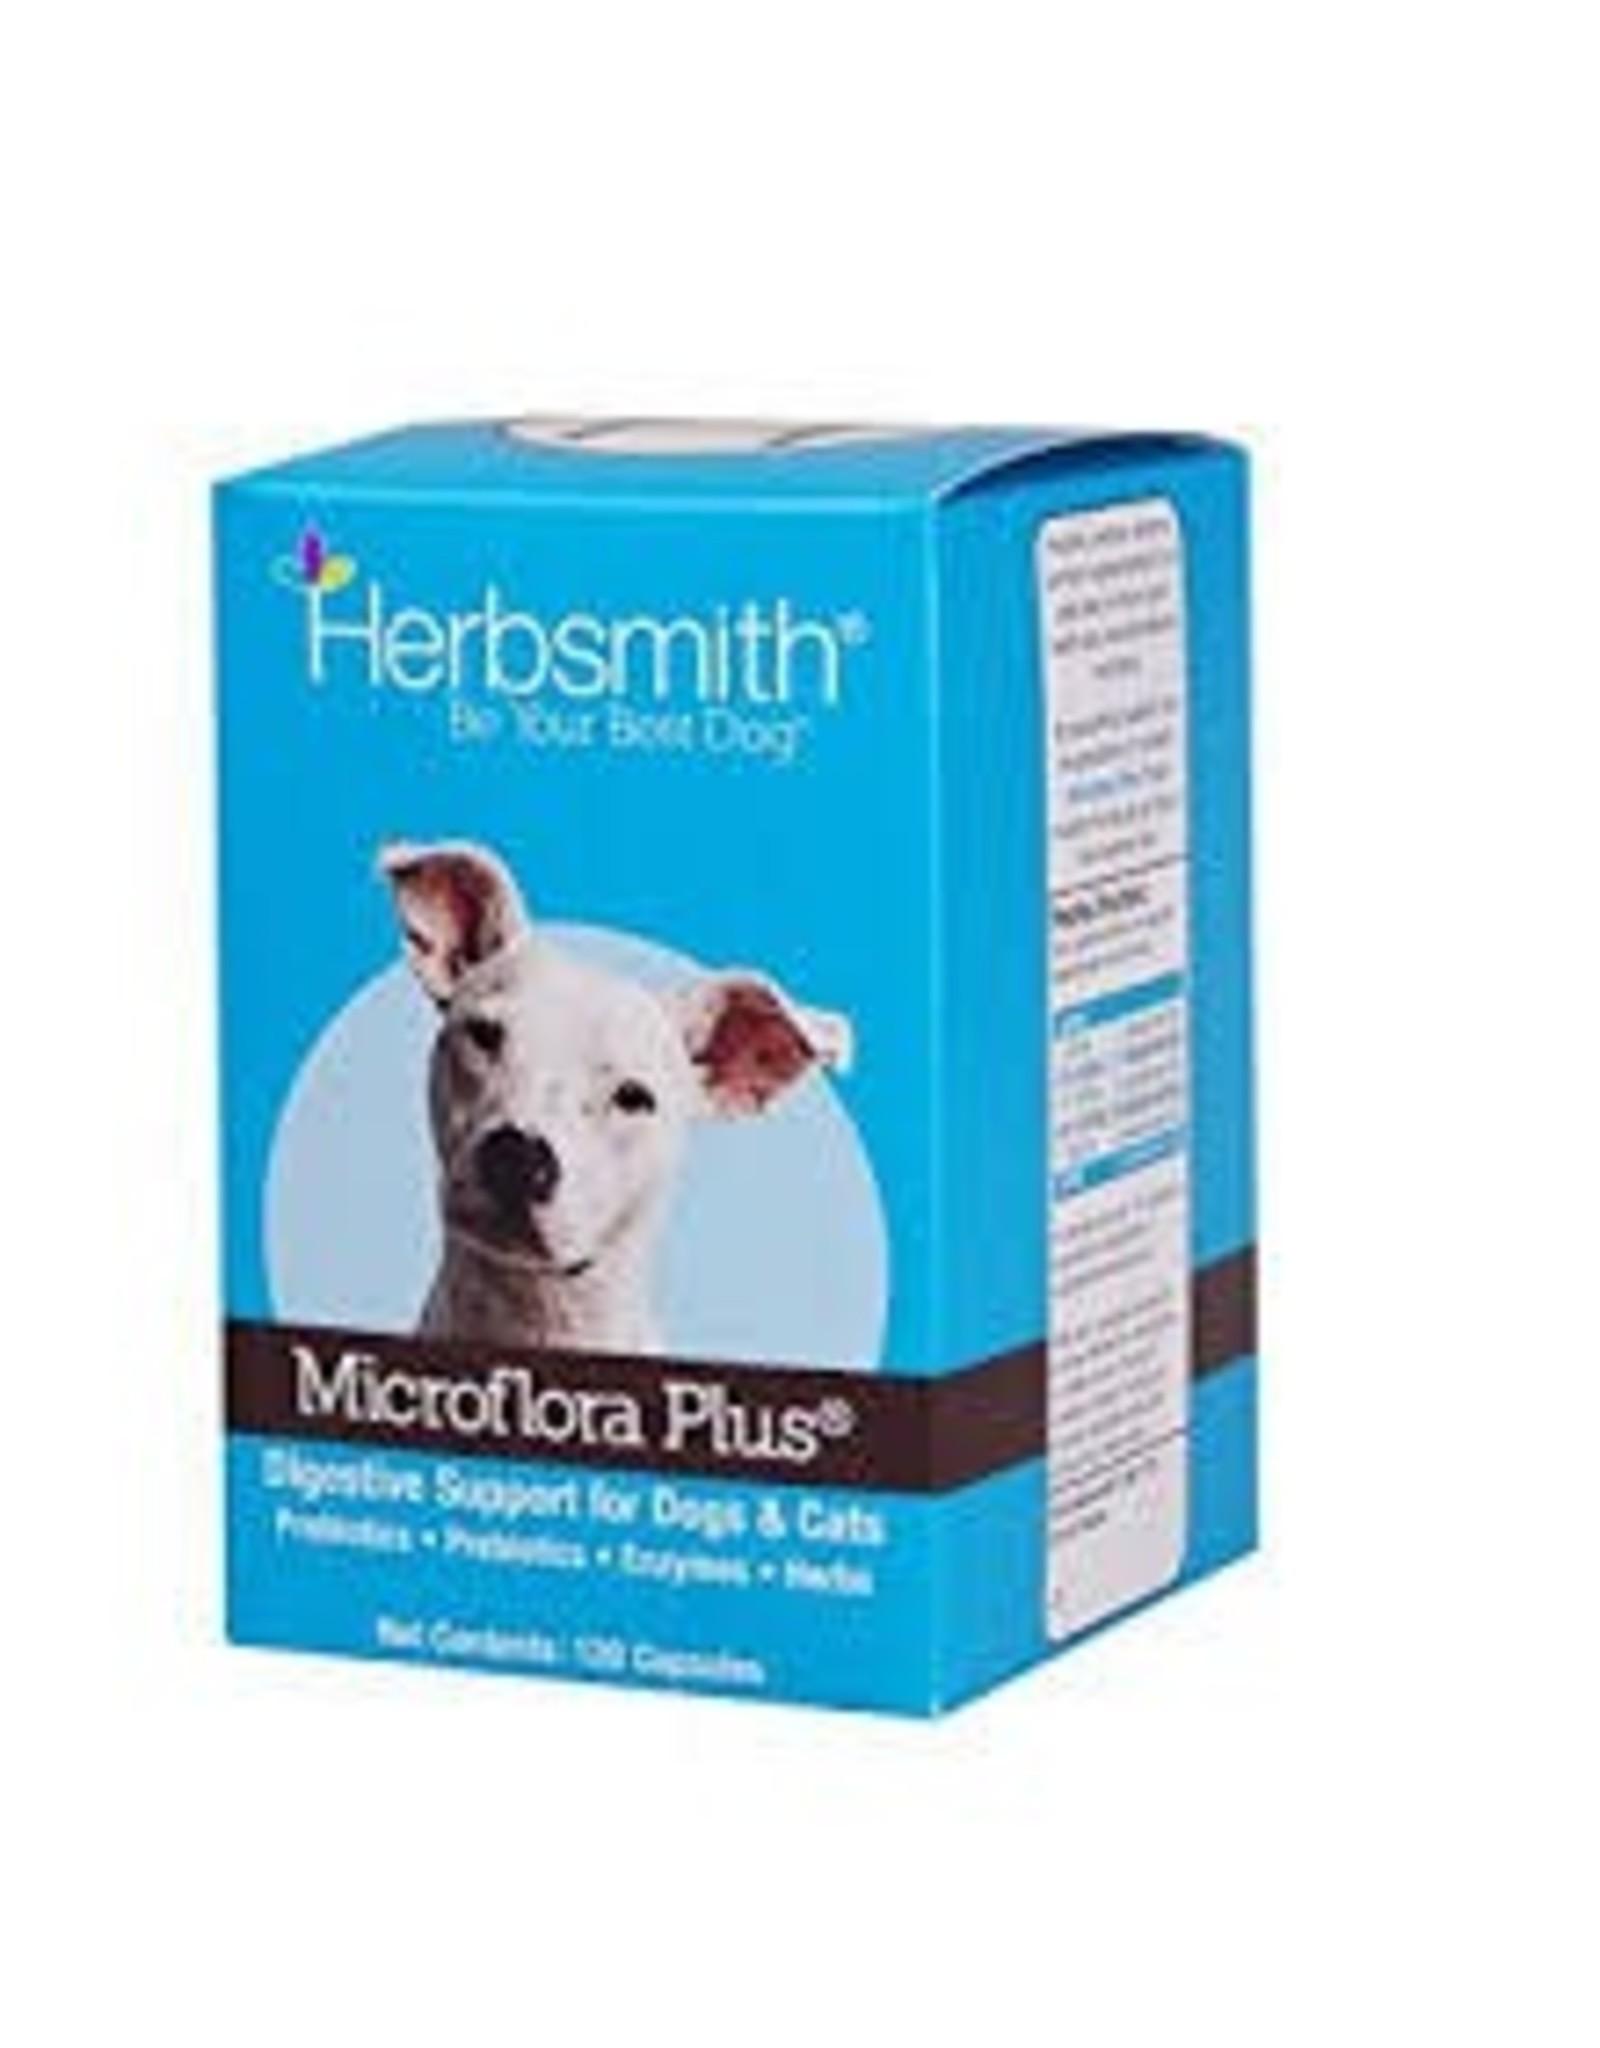 HERBSMITH HERBSMITH MICRO FLORA PLUS 120